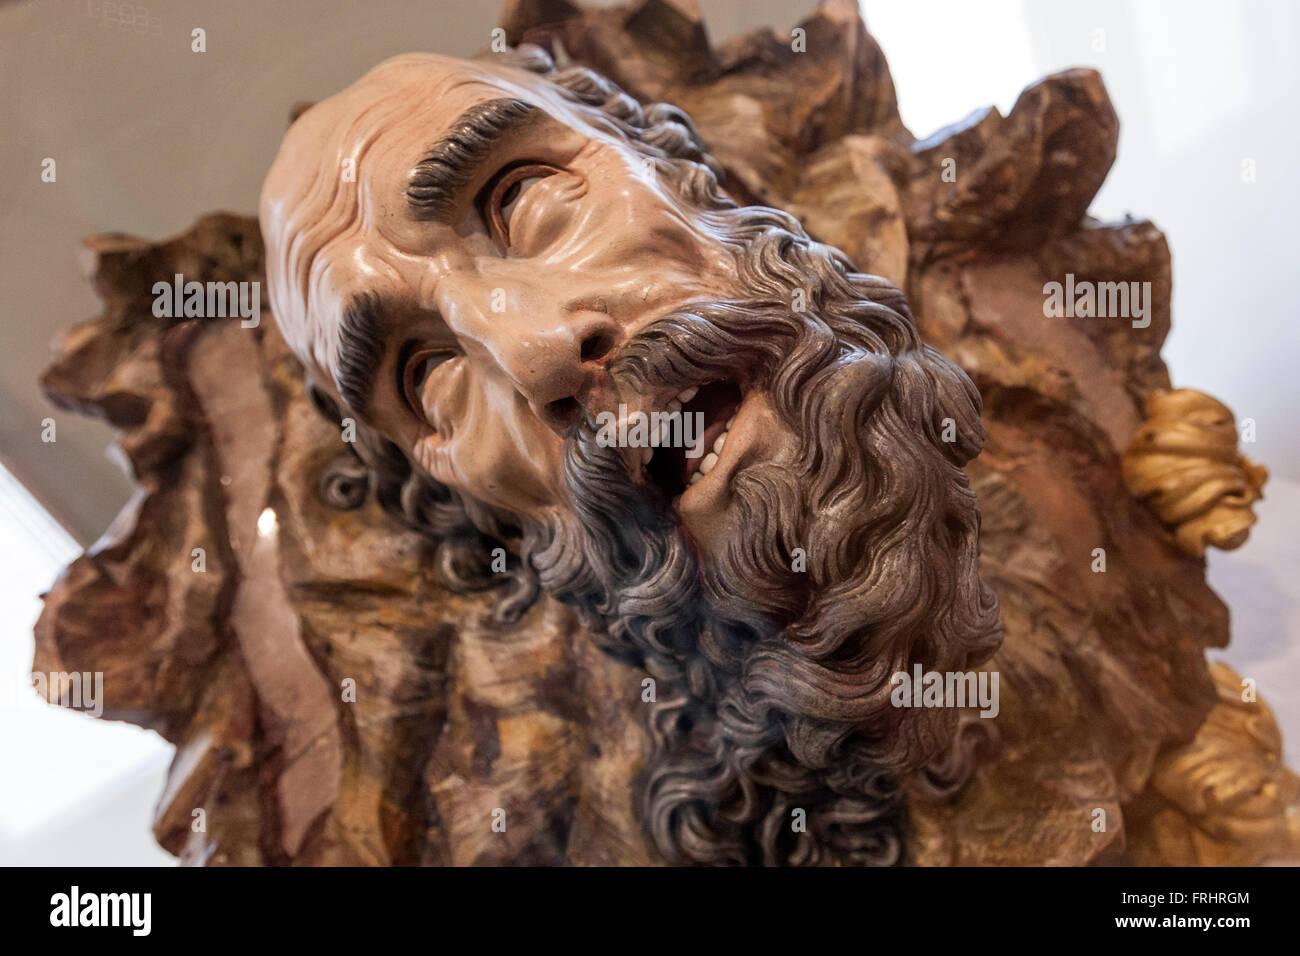 Wood sculpture of Saint Paul head in National Sculpture Museum, Museo Nacional de San Gregorio, Valladolid, Spain - Stock Image